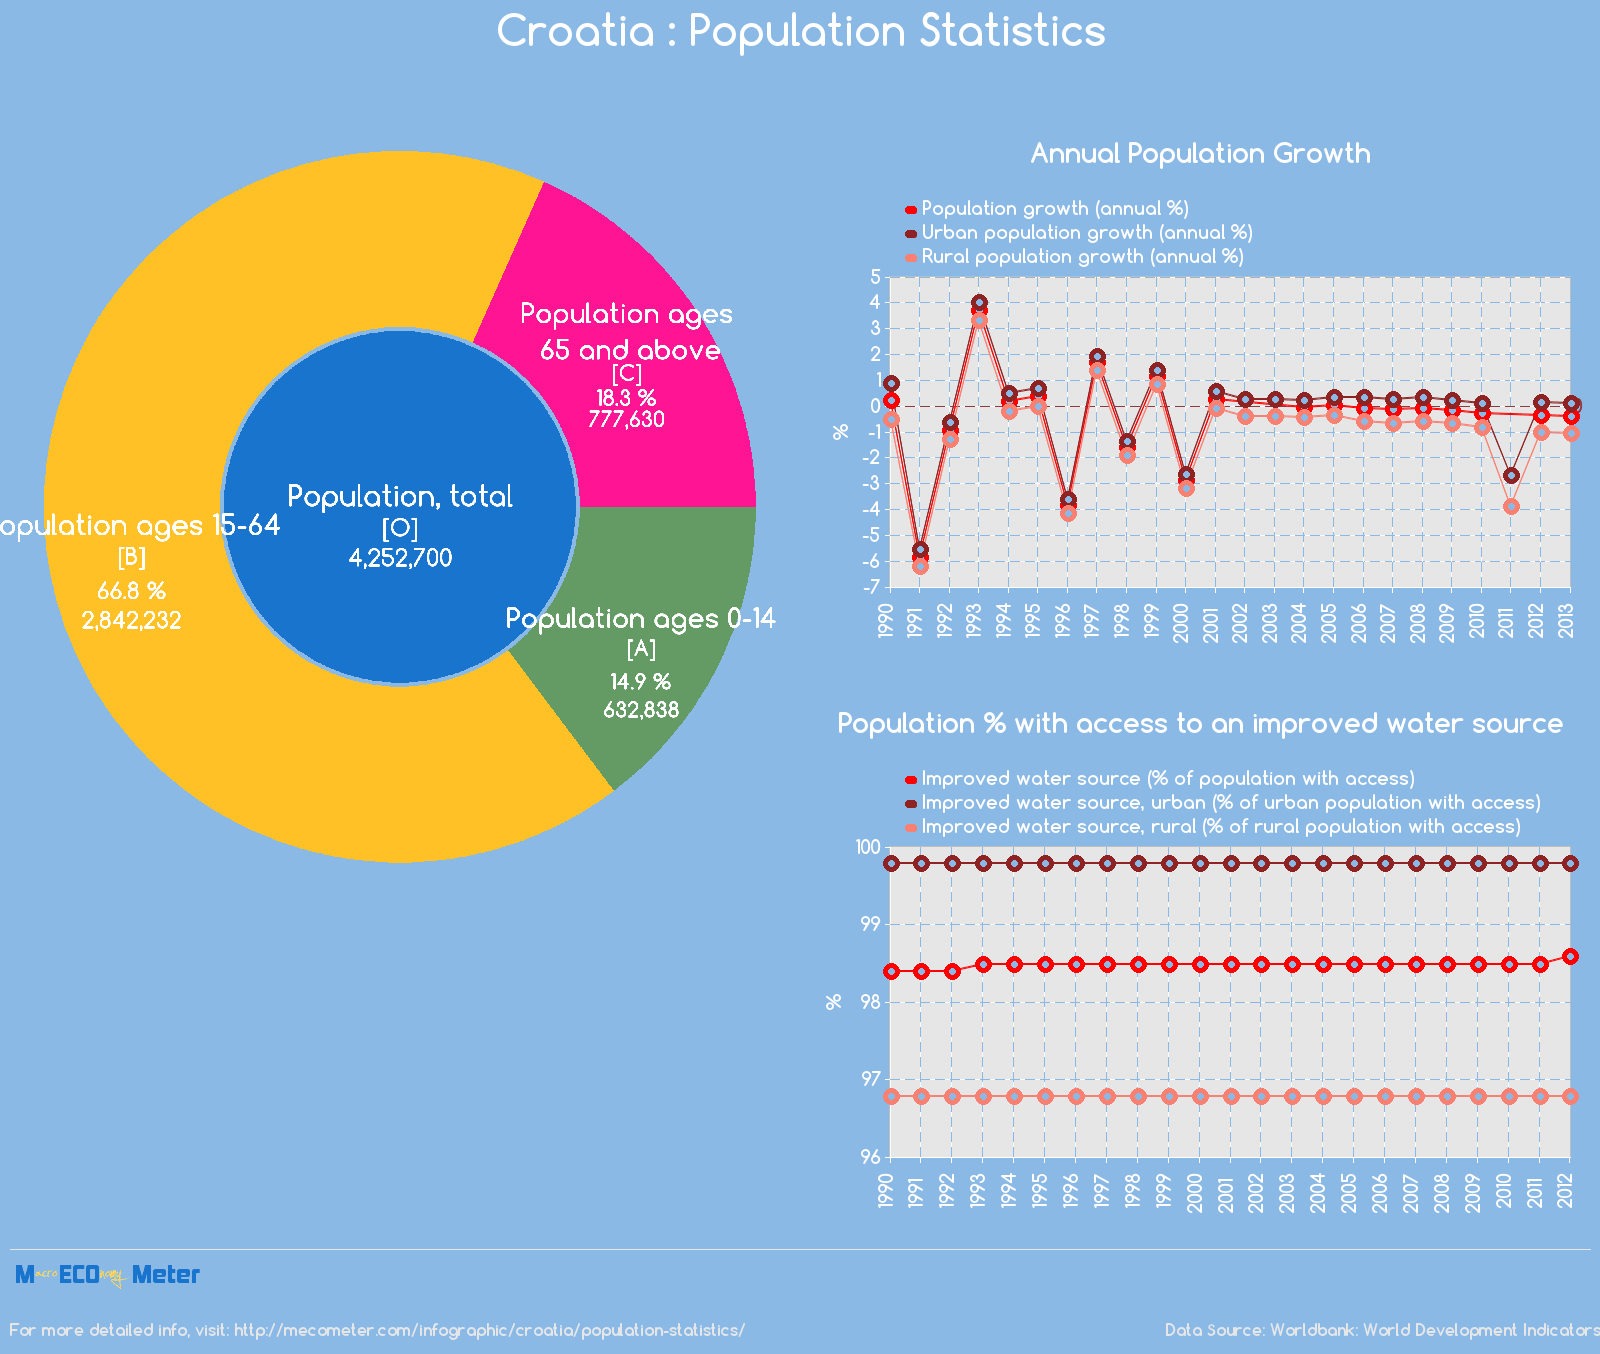 Croatia : Population Statistics